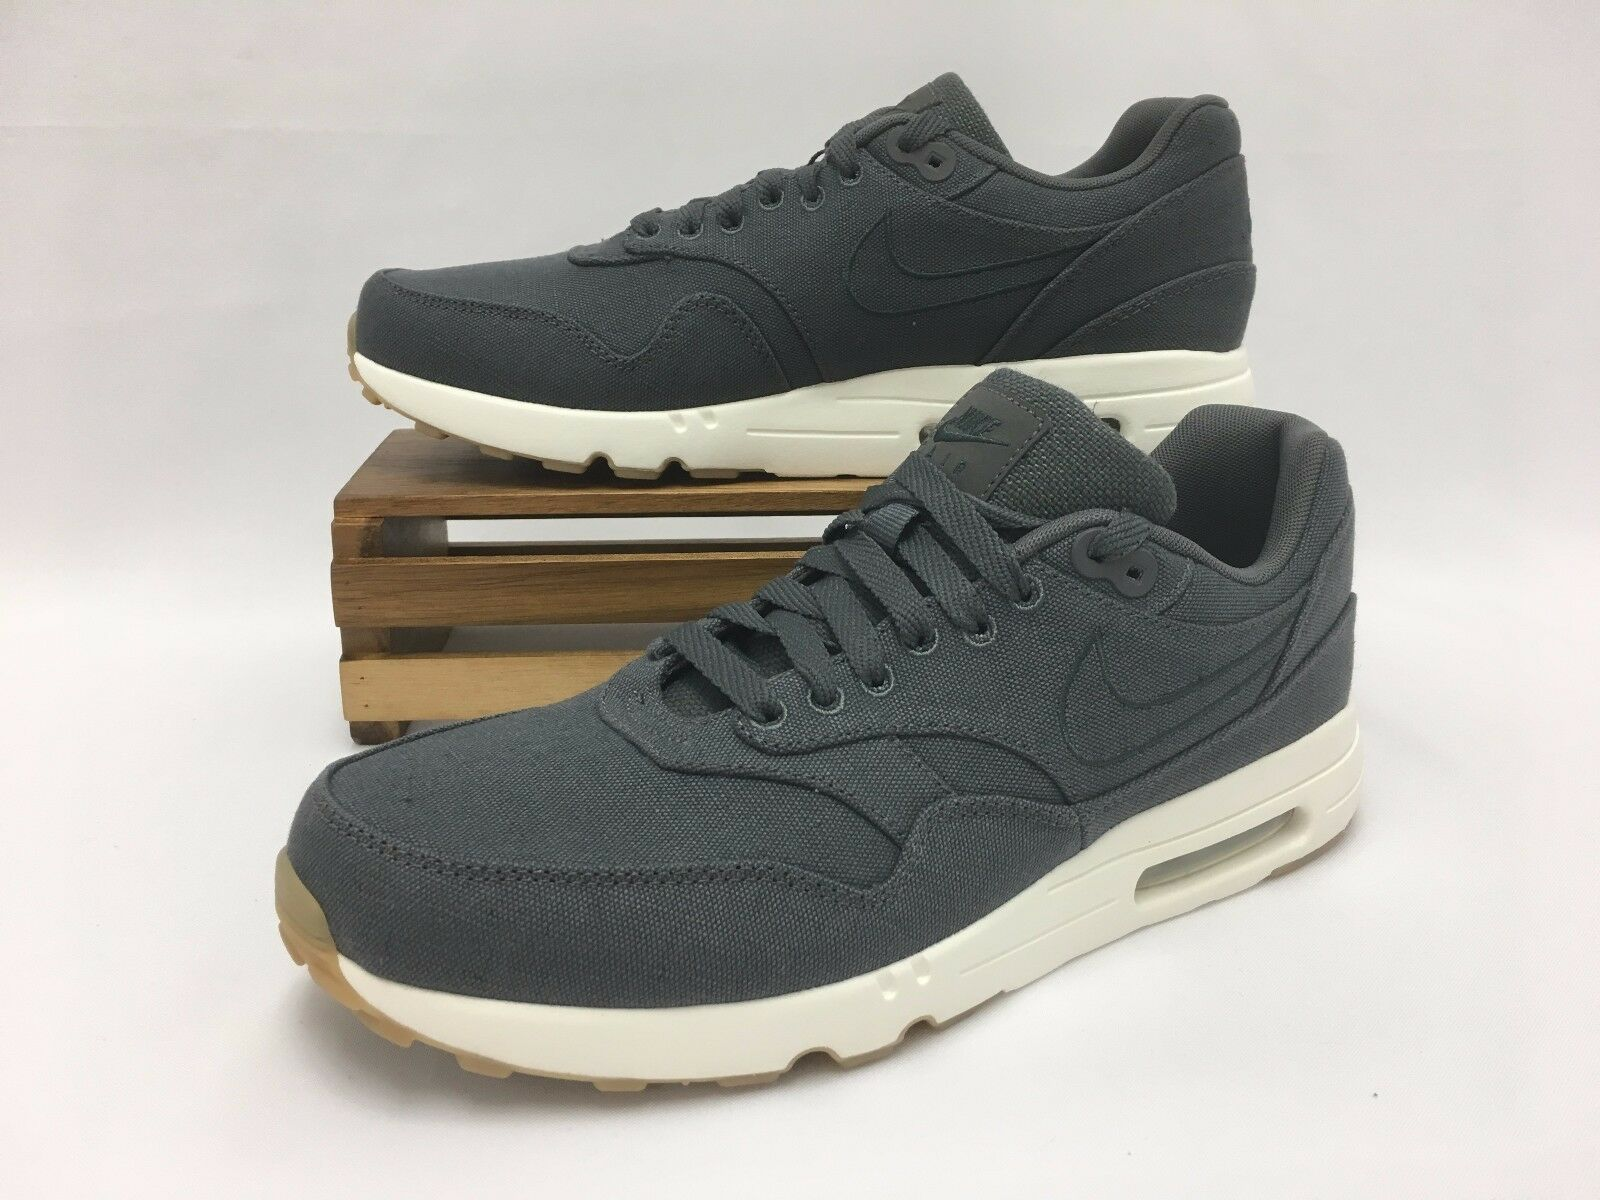 0 002 Gray Txt Air New Men's Max Dark 1 Gum 898009 2 Nike Anthracite Ultra POXiTlkwZu